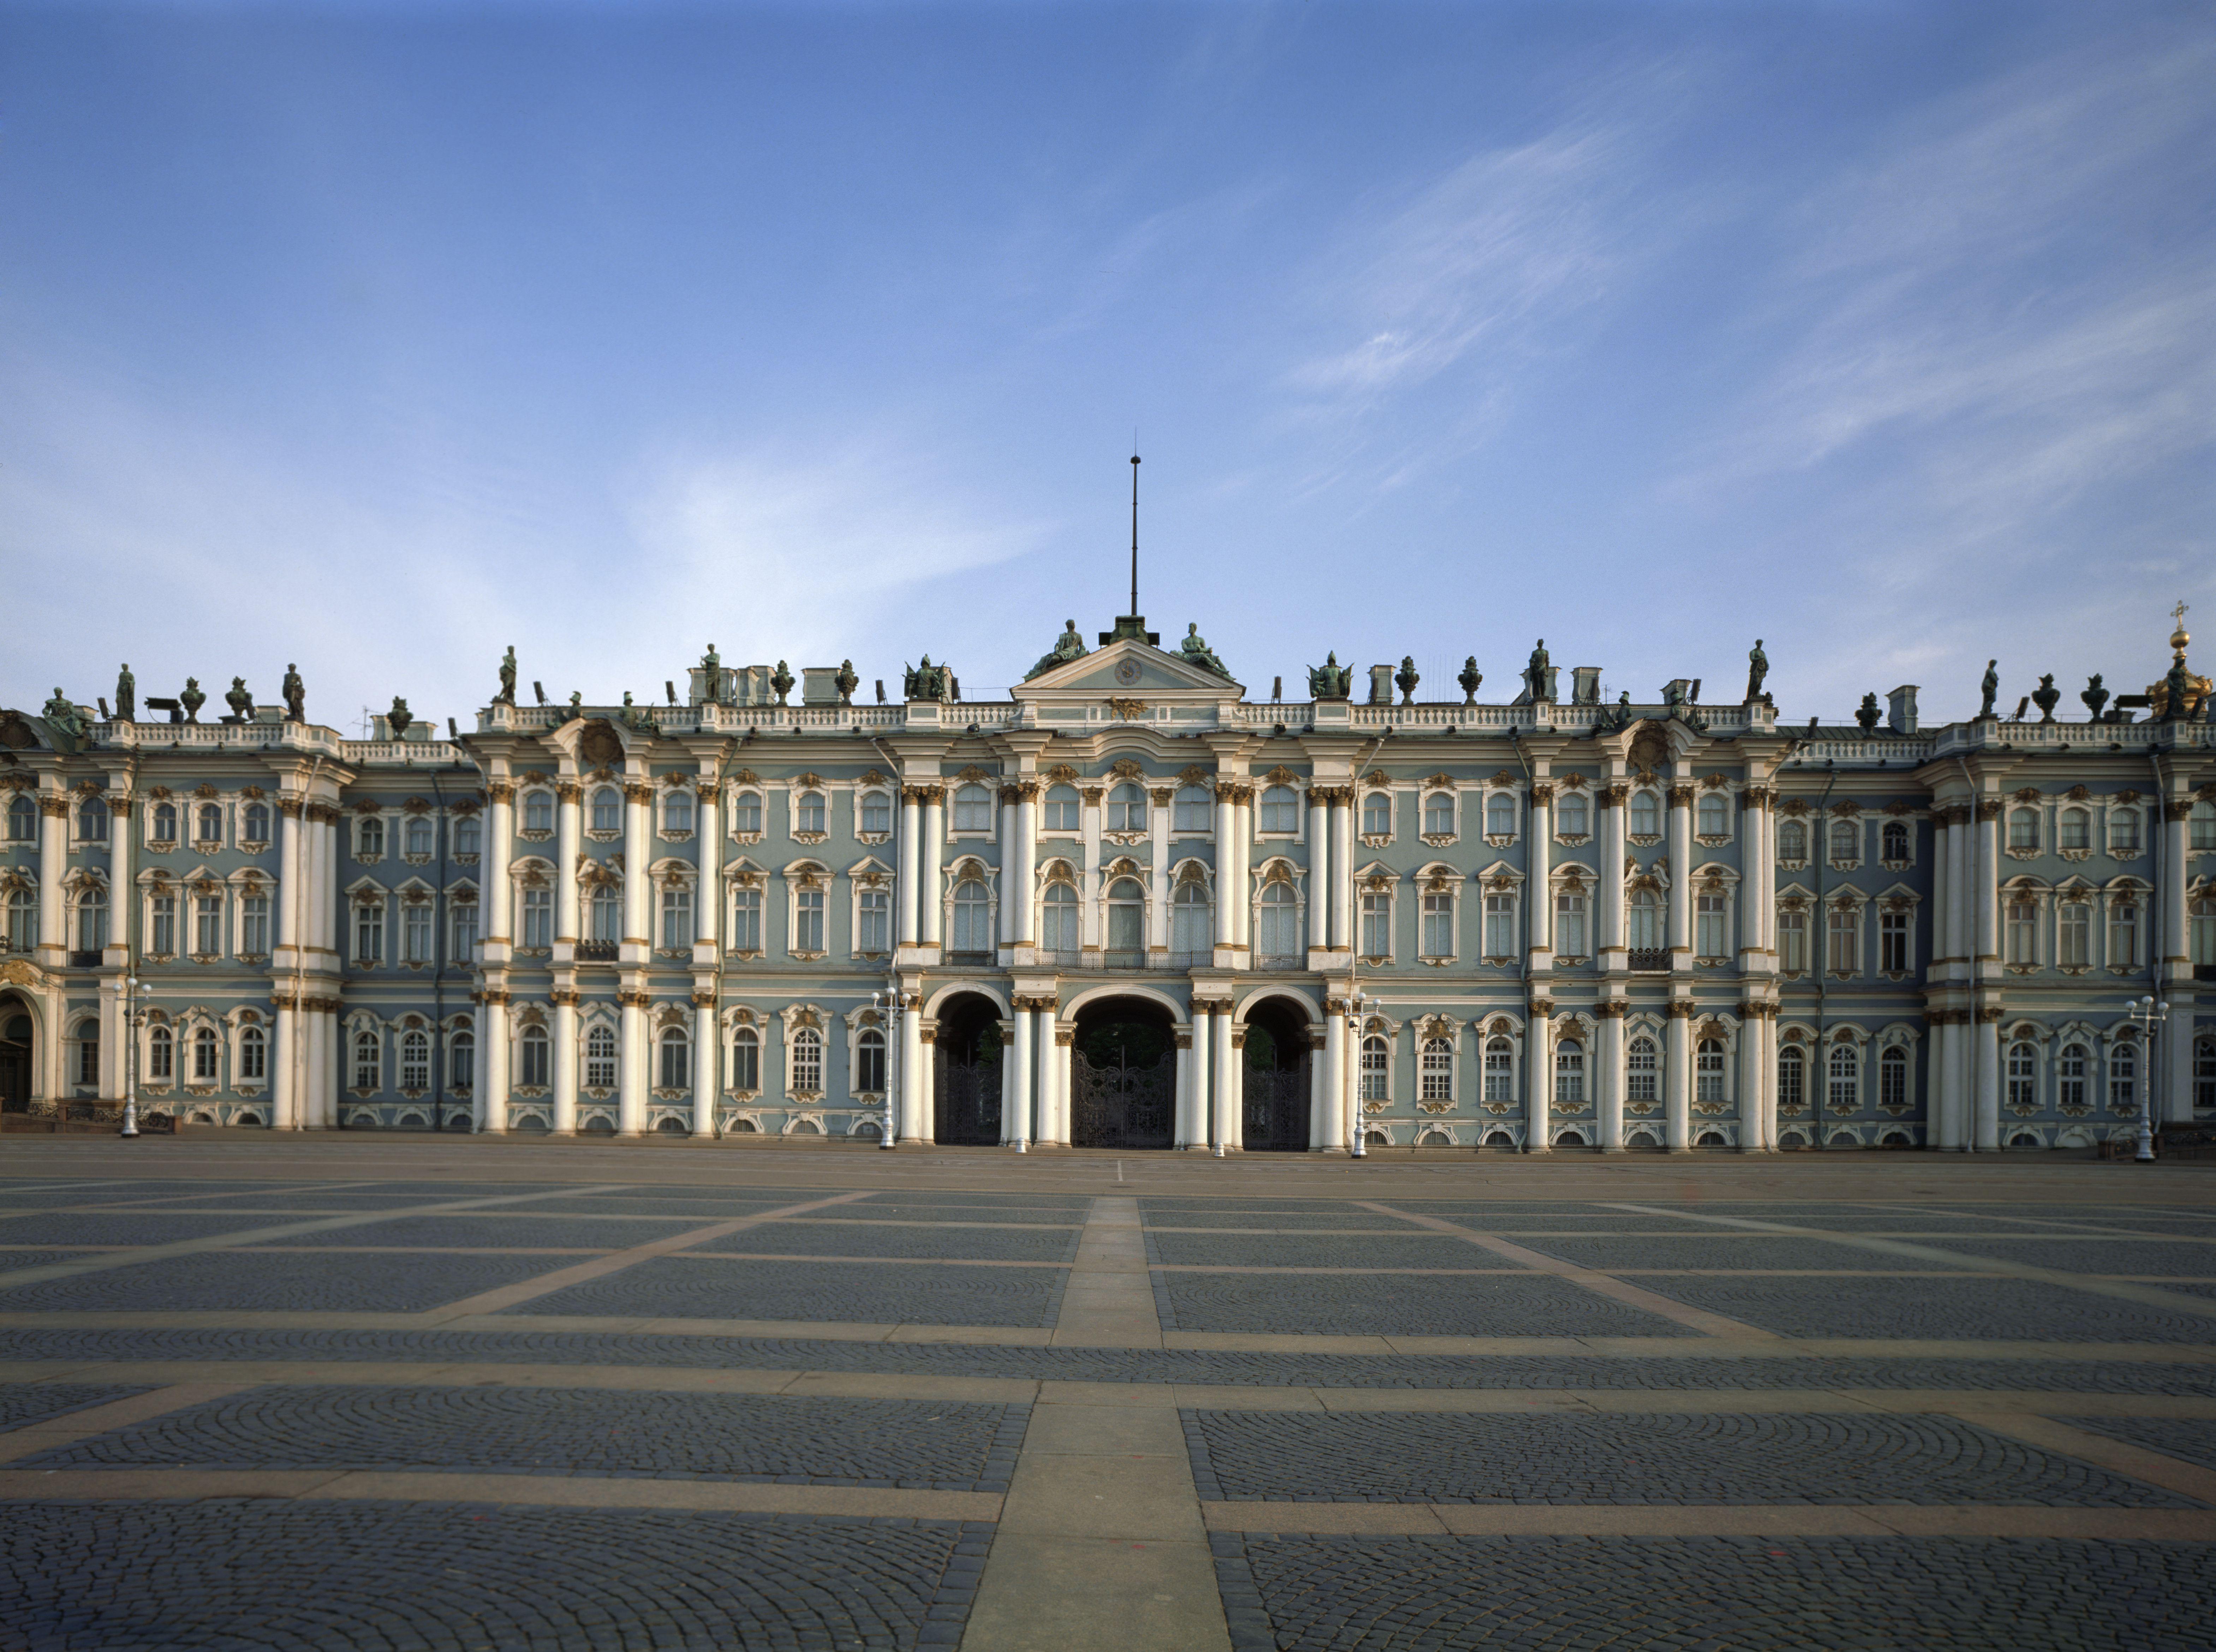 ornate, horizontal-oriented palace facade with masonry plaza entrance